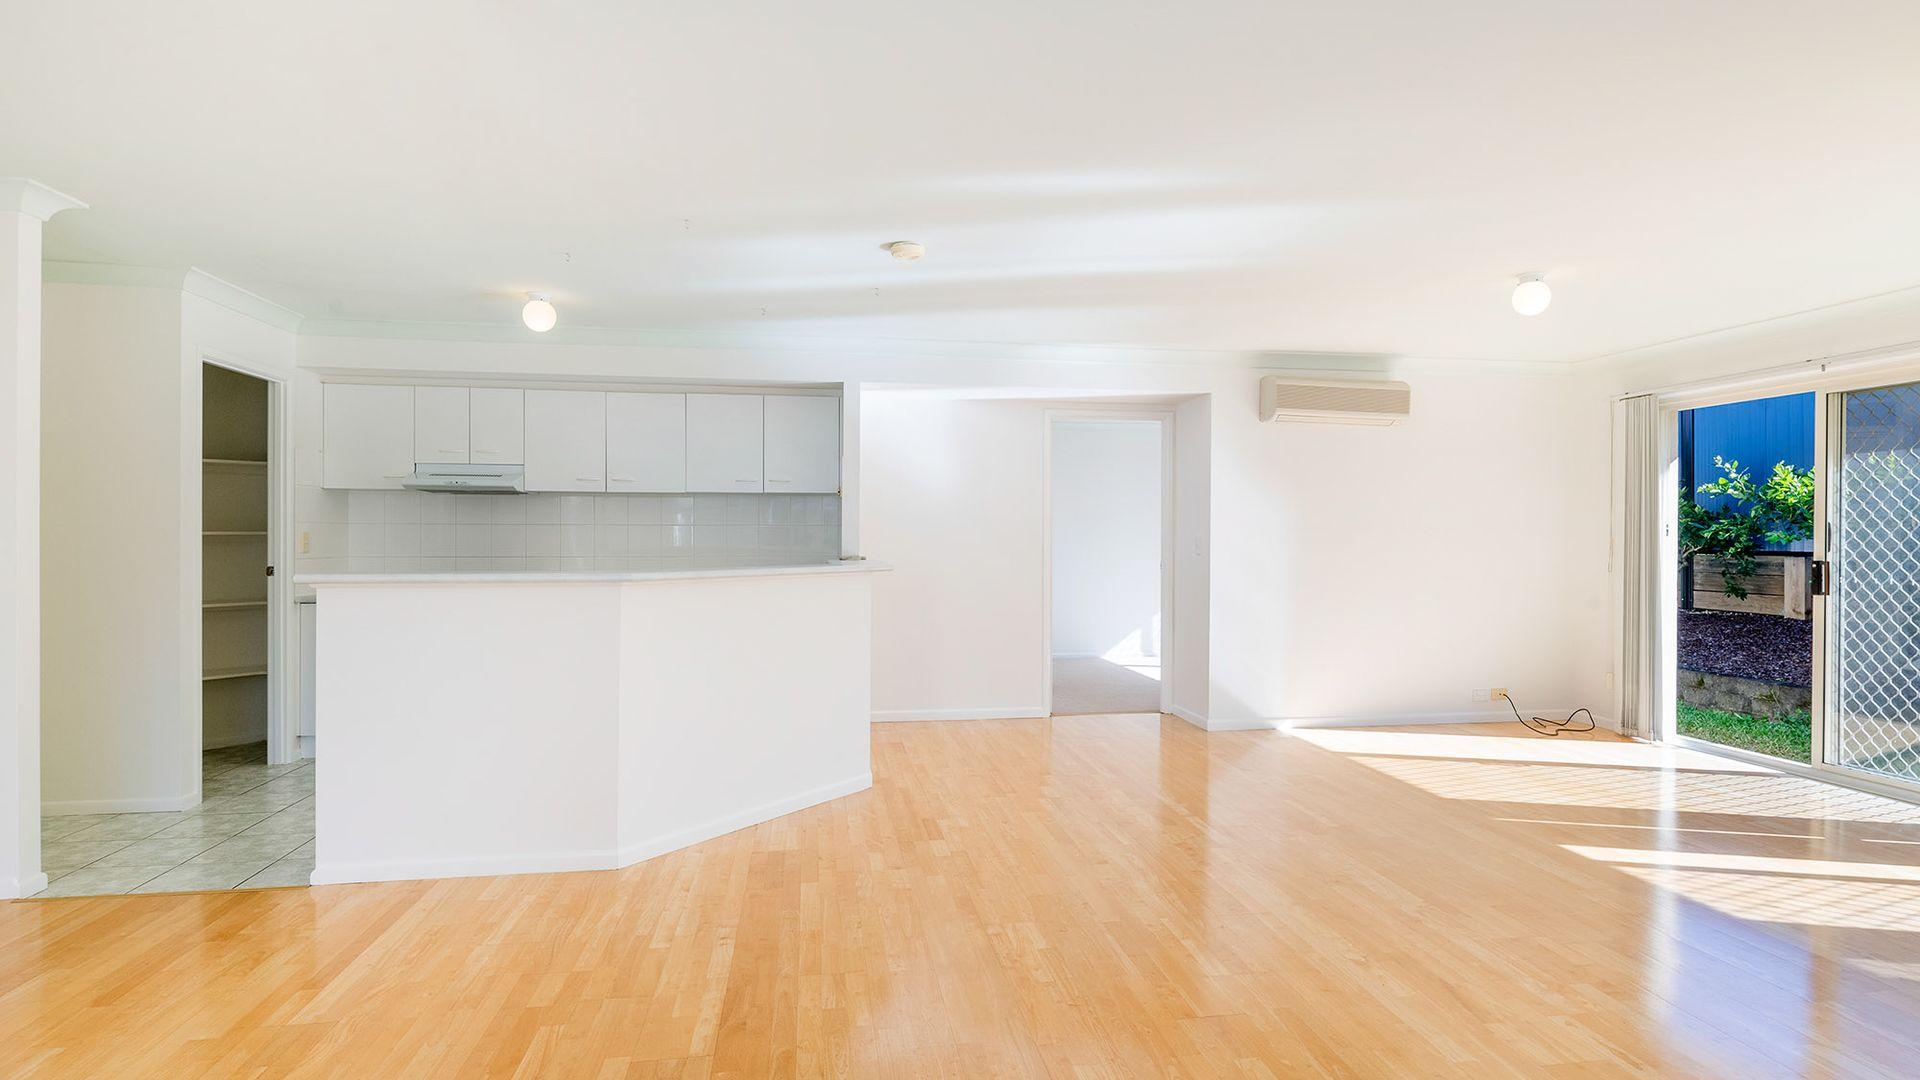 8 Gumnut Court, Calamvale QLD 4116, Image 1